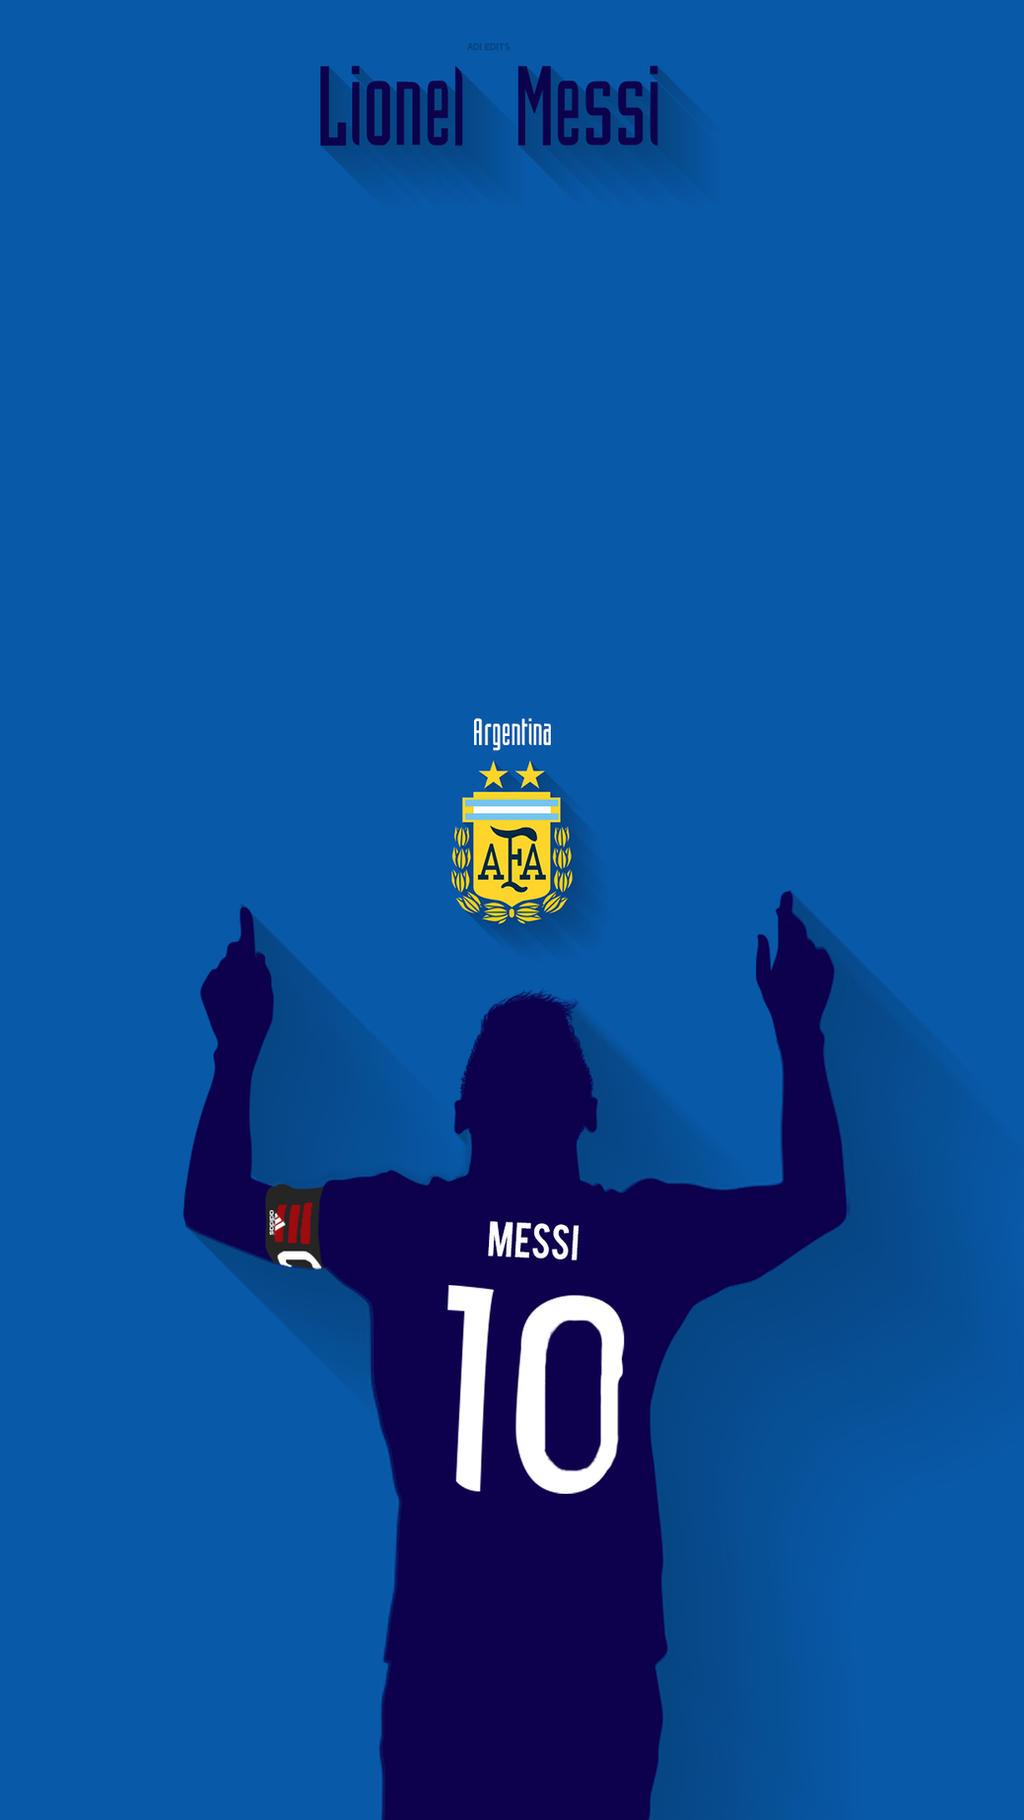 Lionel Messi Argentina Lockscreen Wallpaper HD By Adi 149